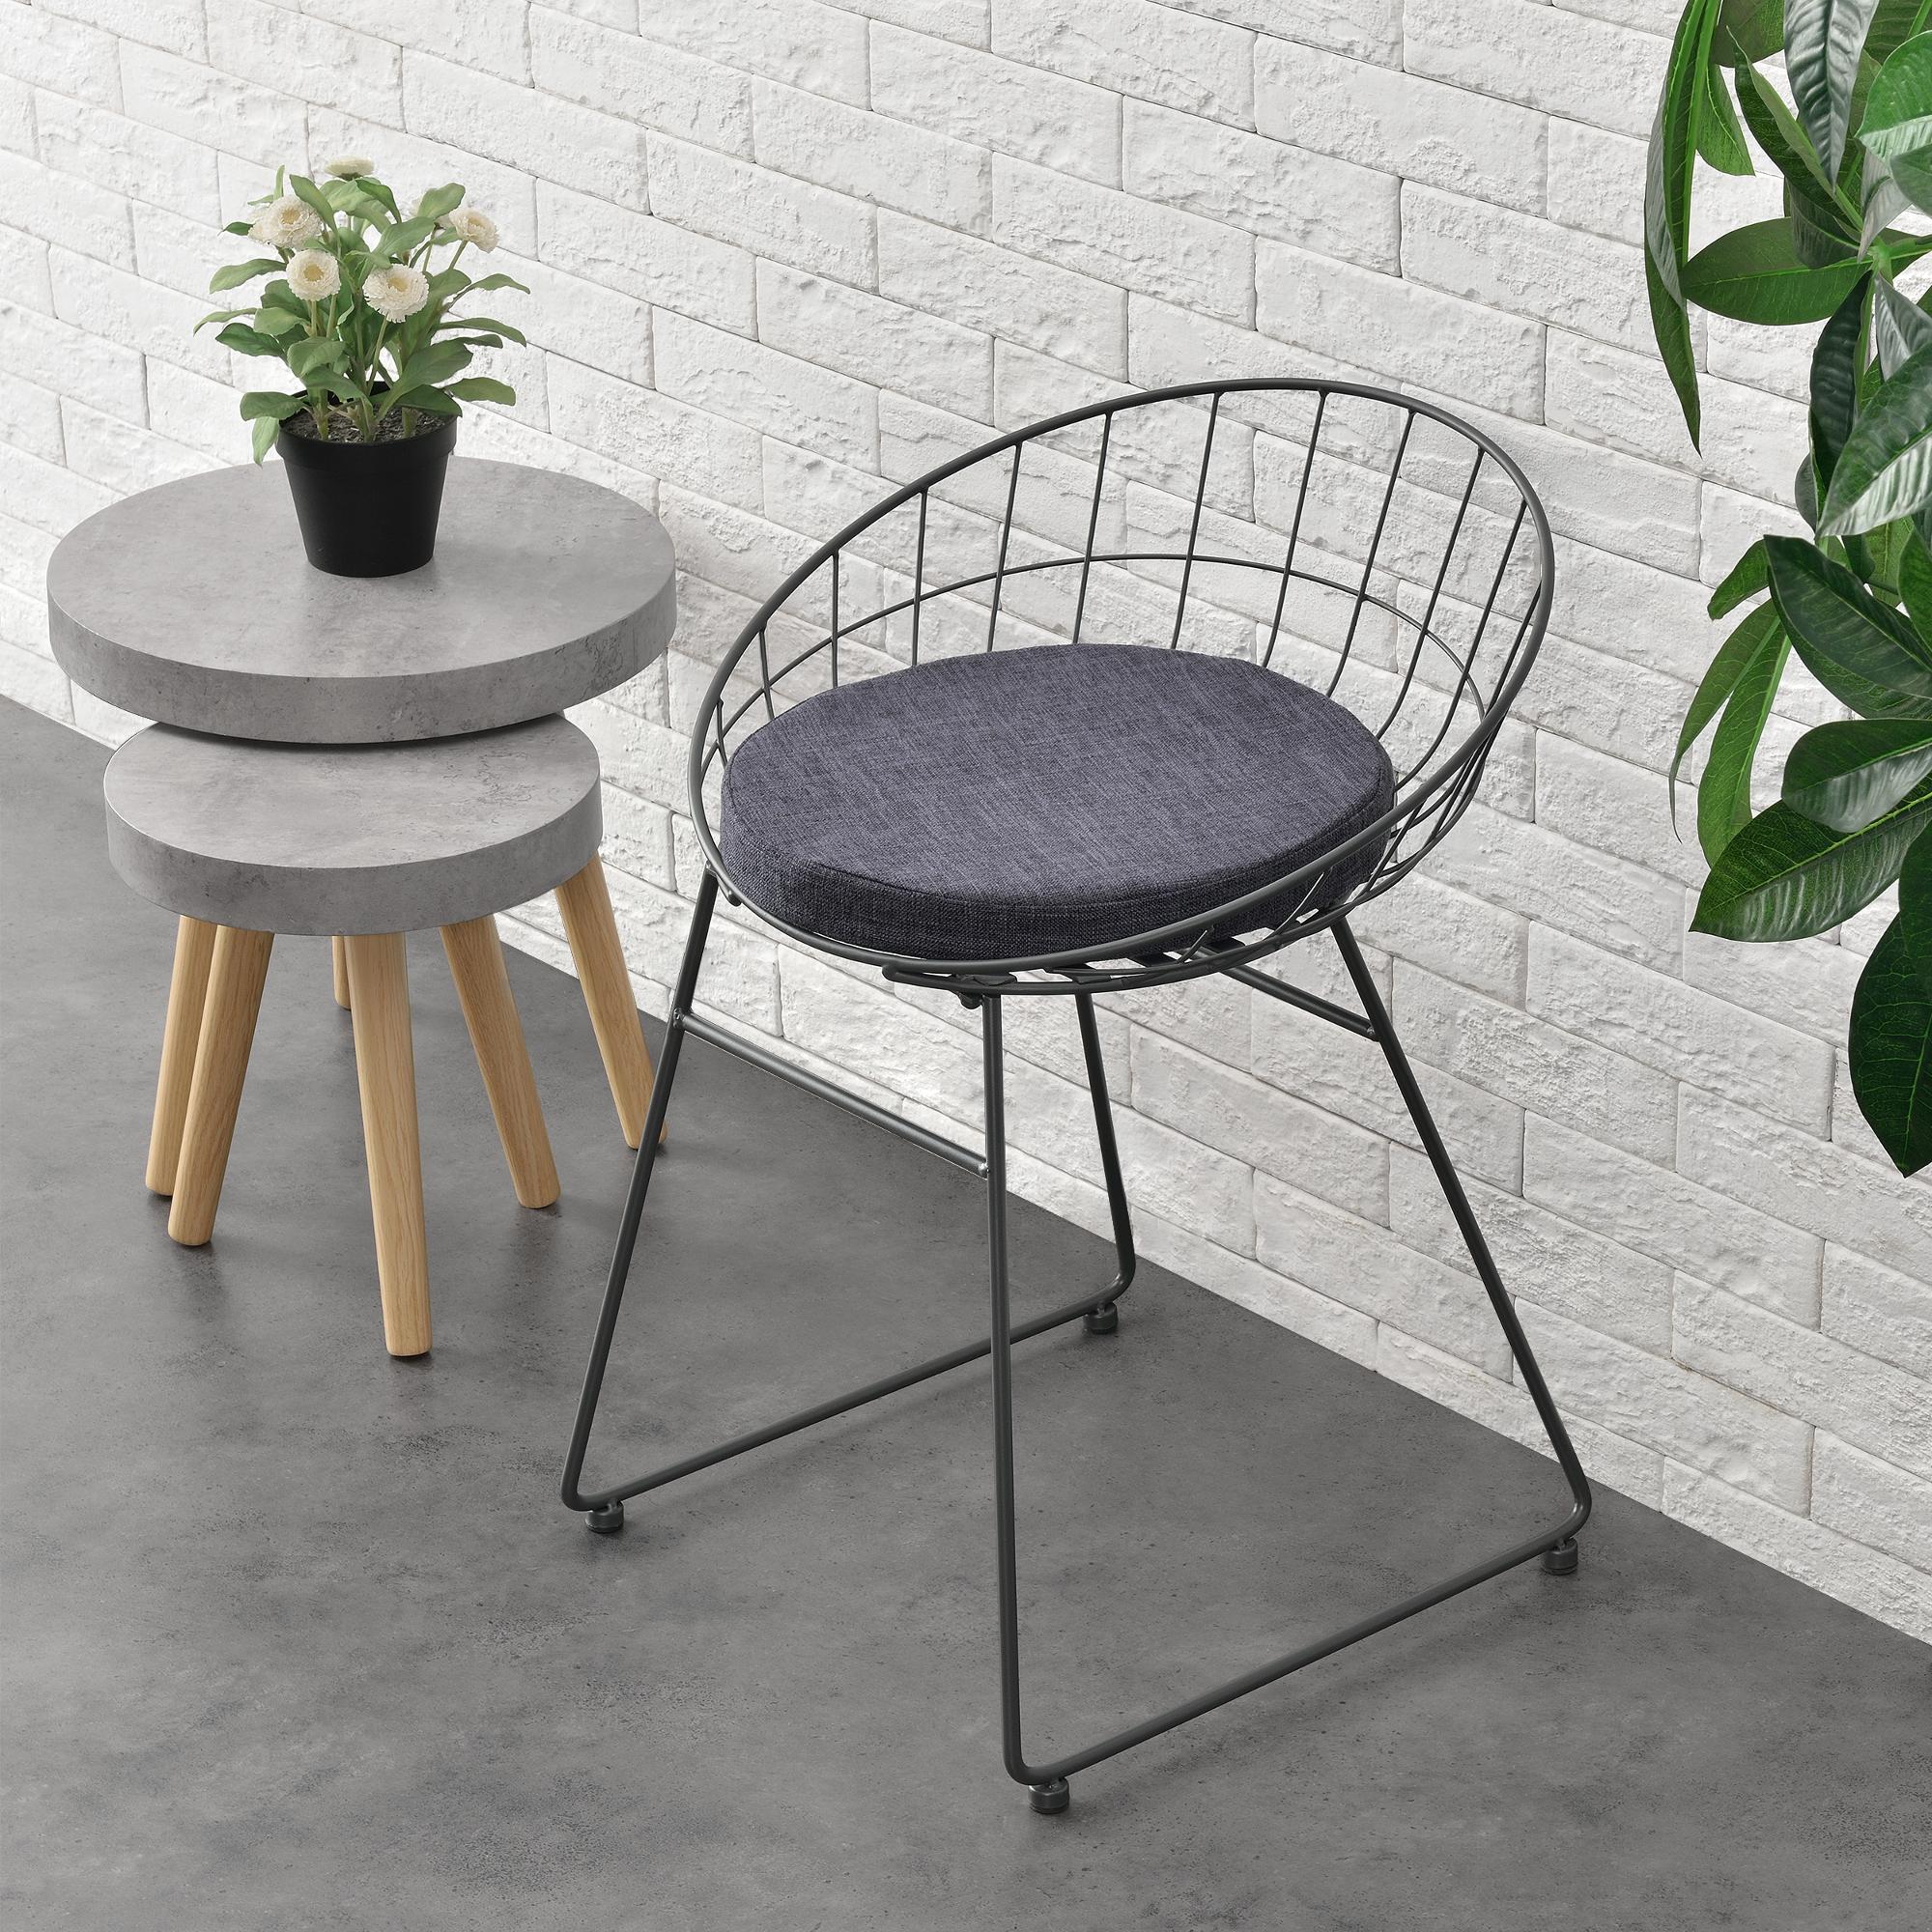 2x design st hle metall grau stuhl set lehnstuhl for Design stuhl metall